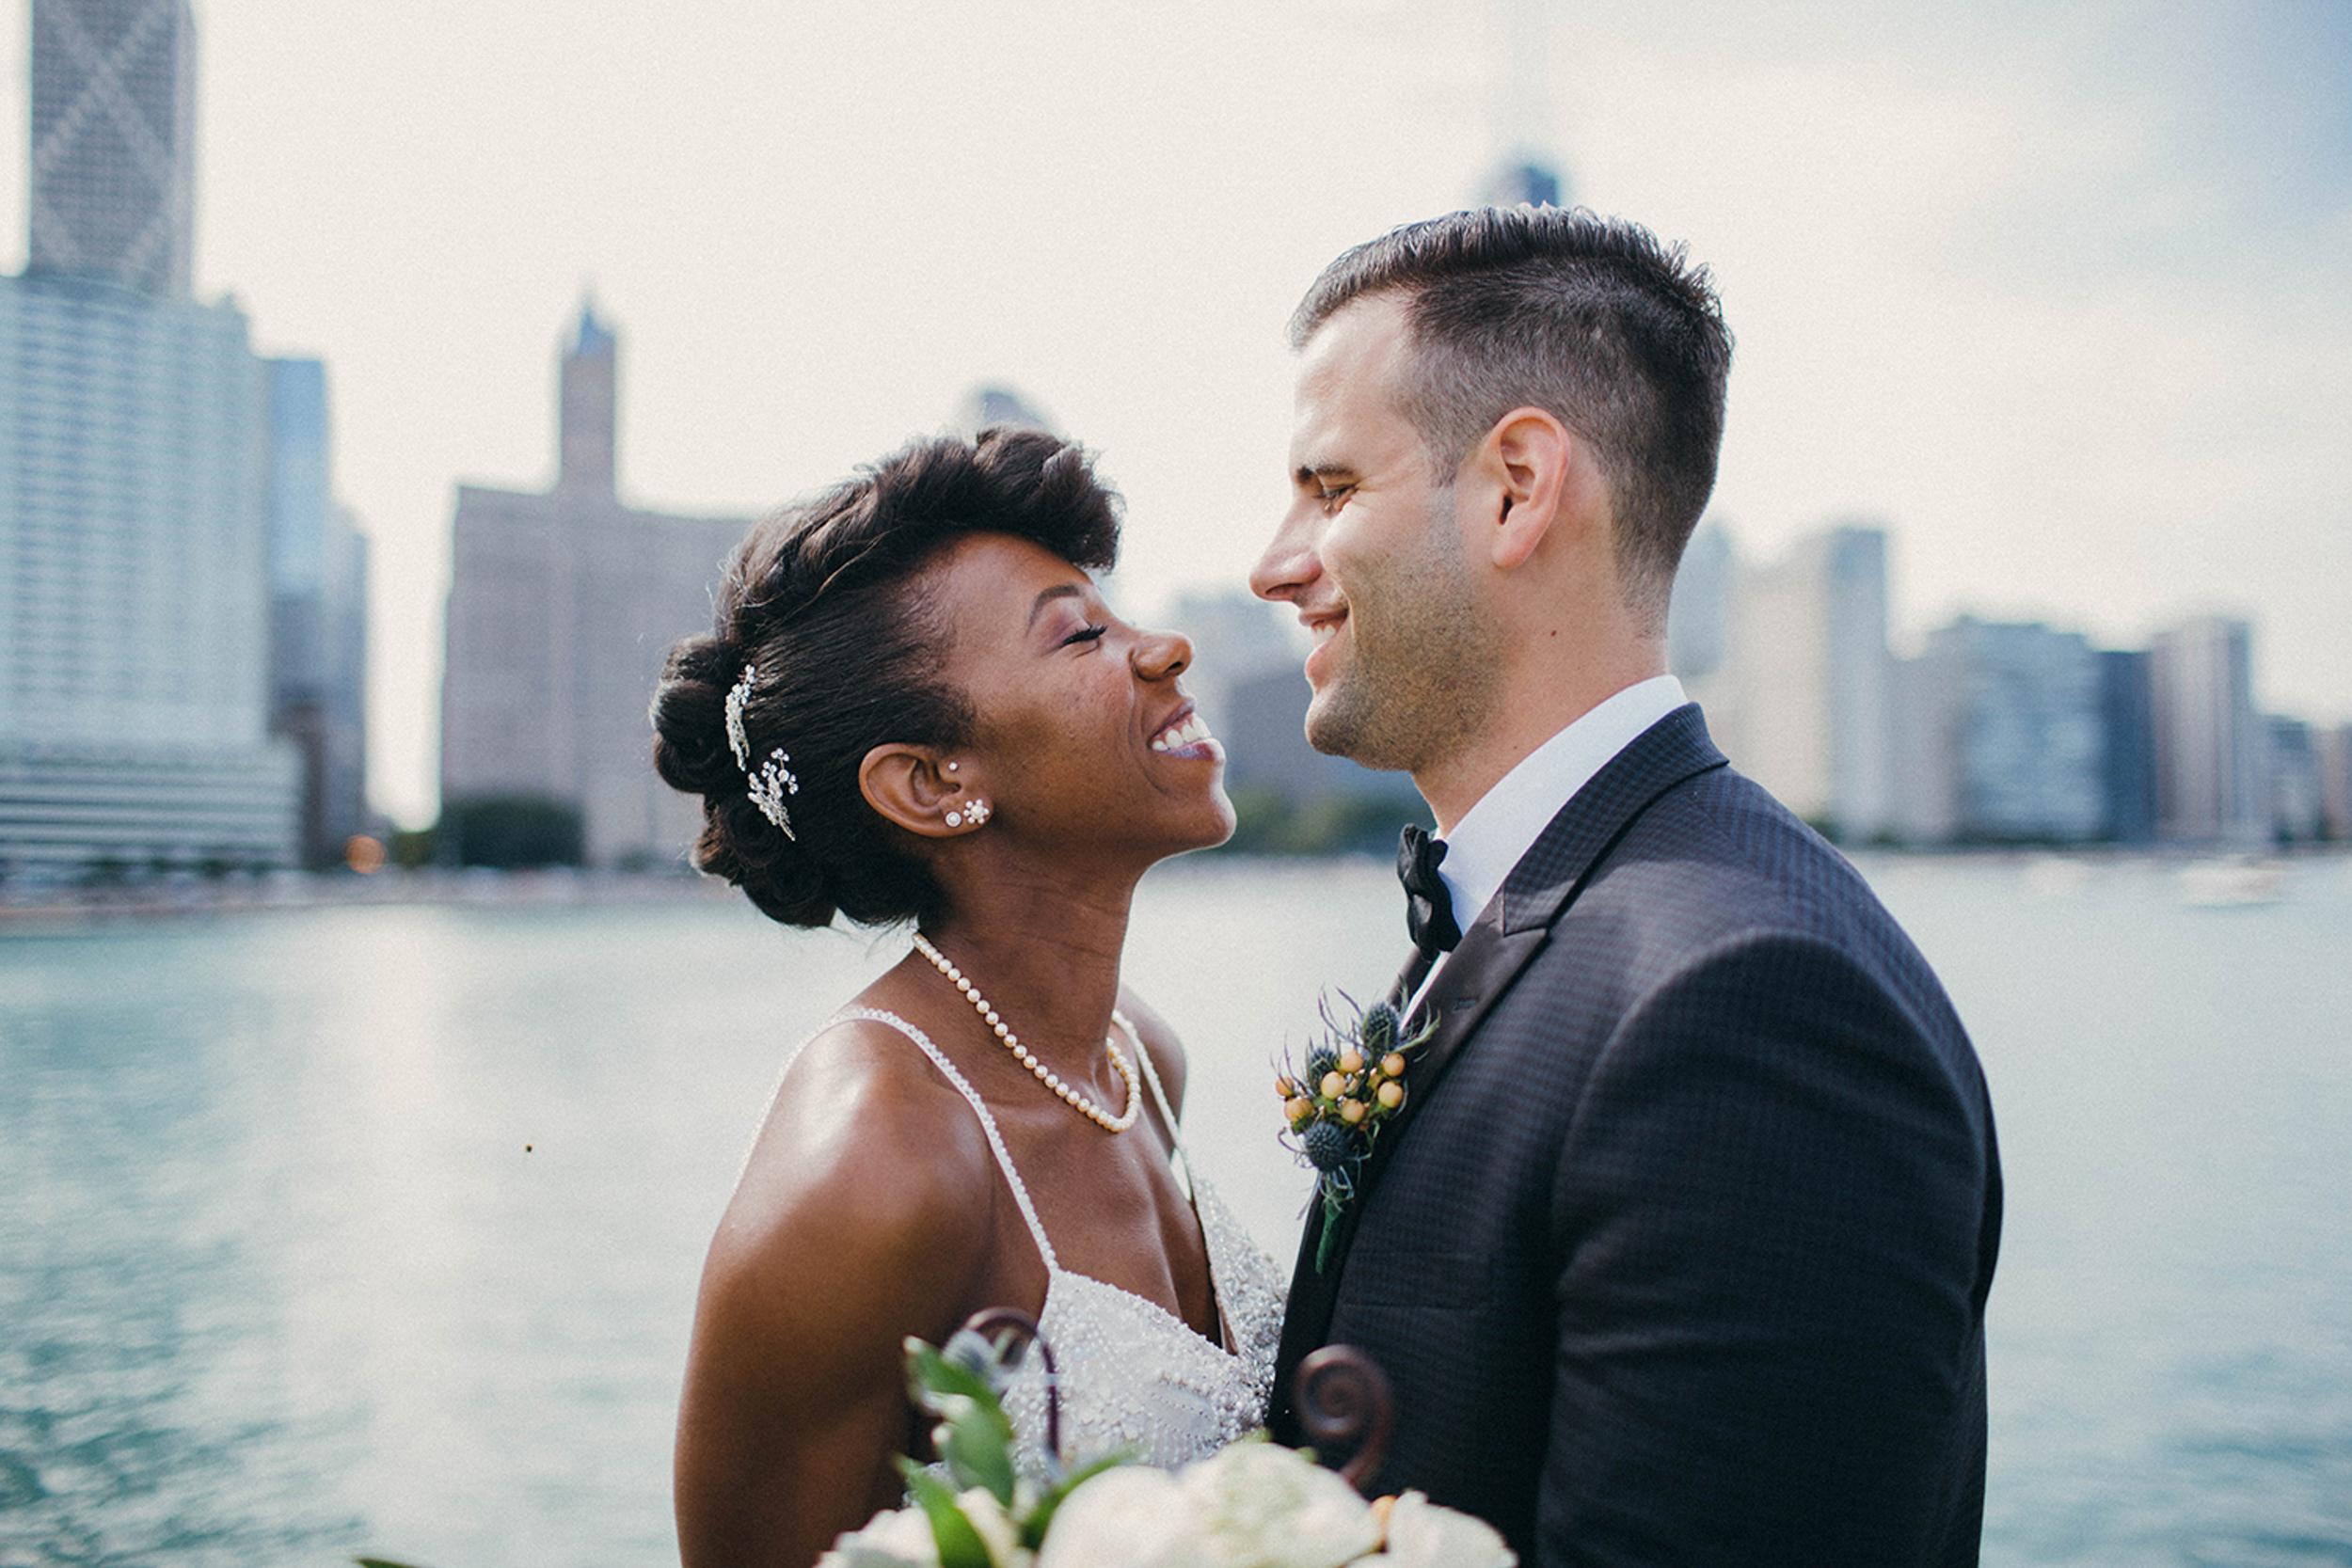 chicago.wedding.urban.intimate.zed451.lake.milton olive park-85.jpg